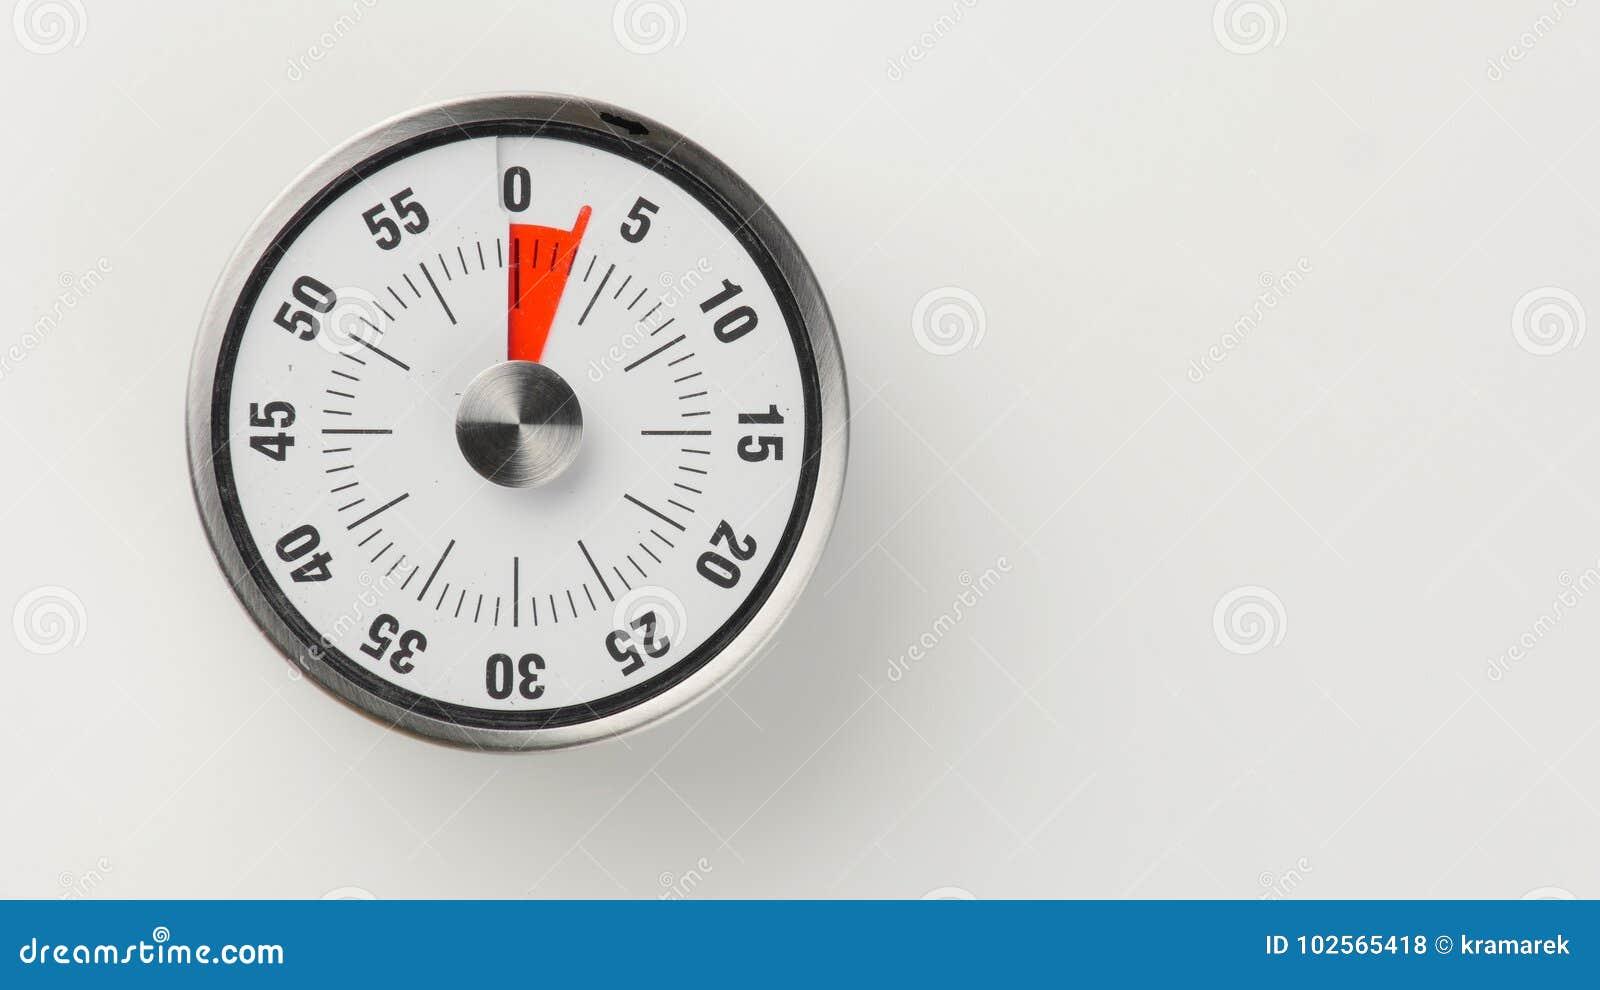 vintage analog kitchen countdown timer  3 minutes